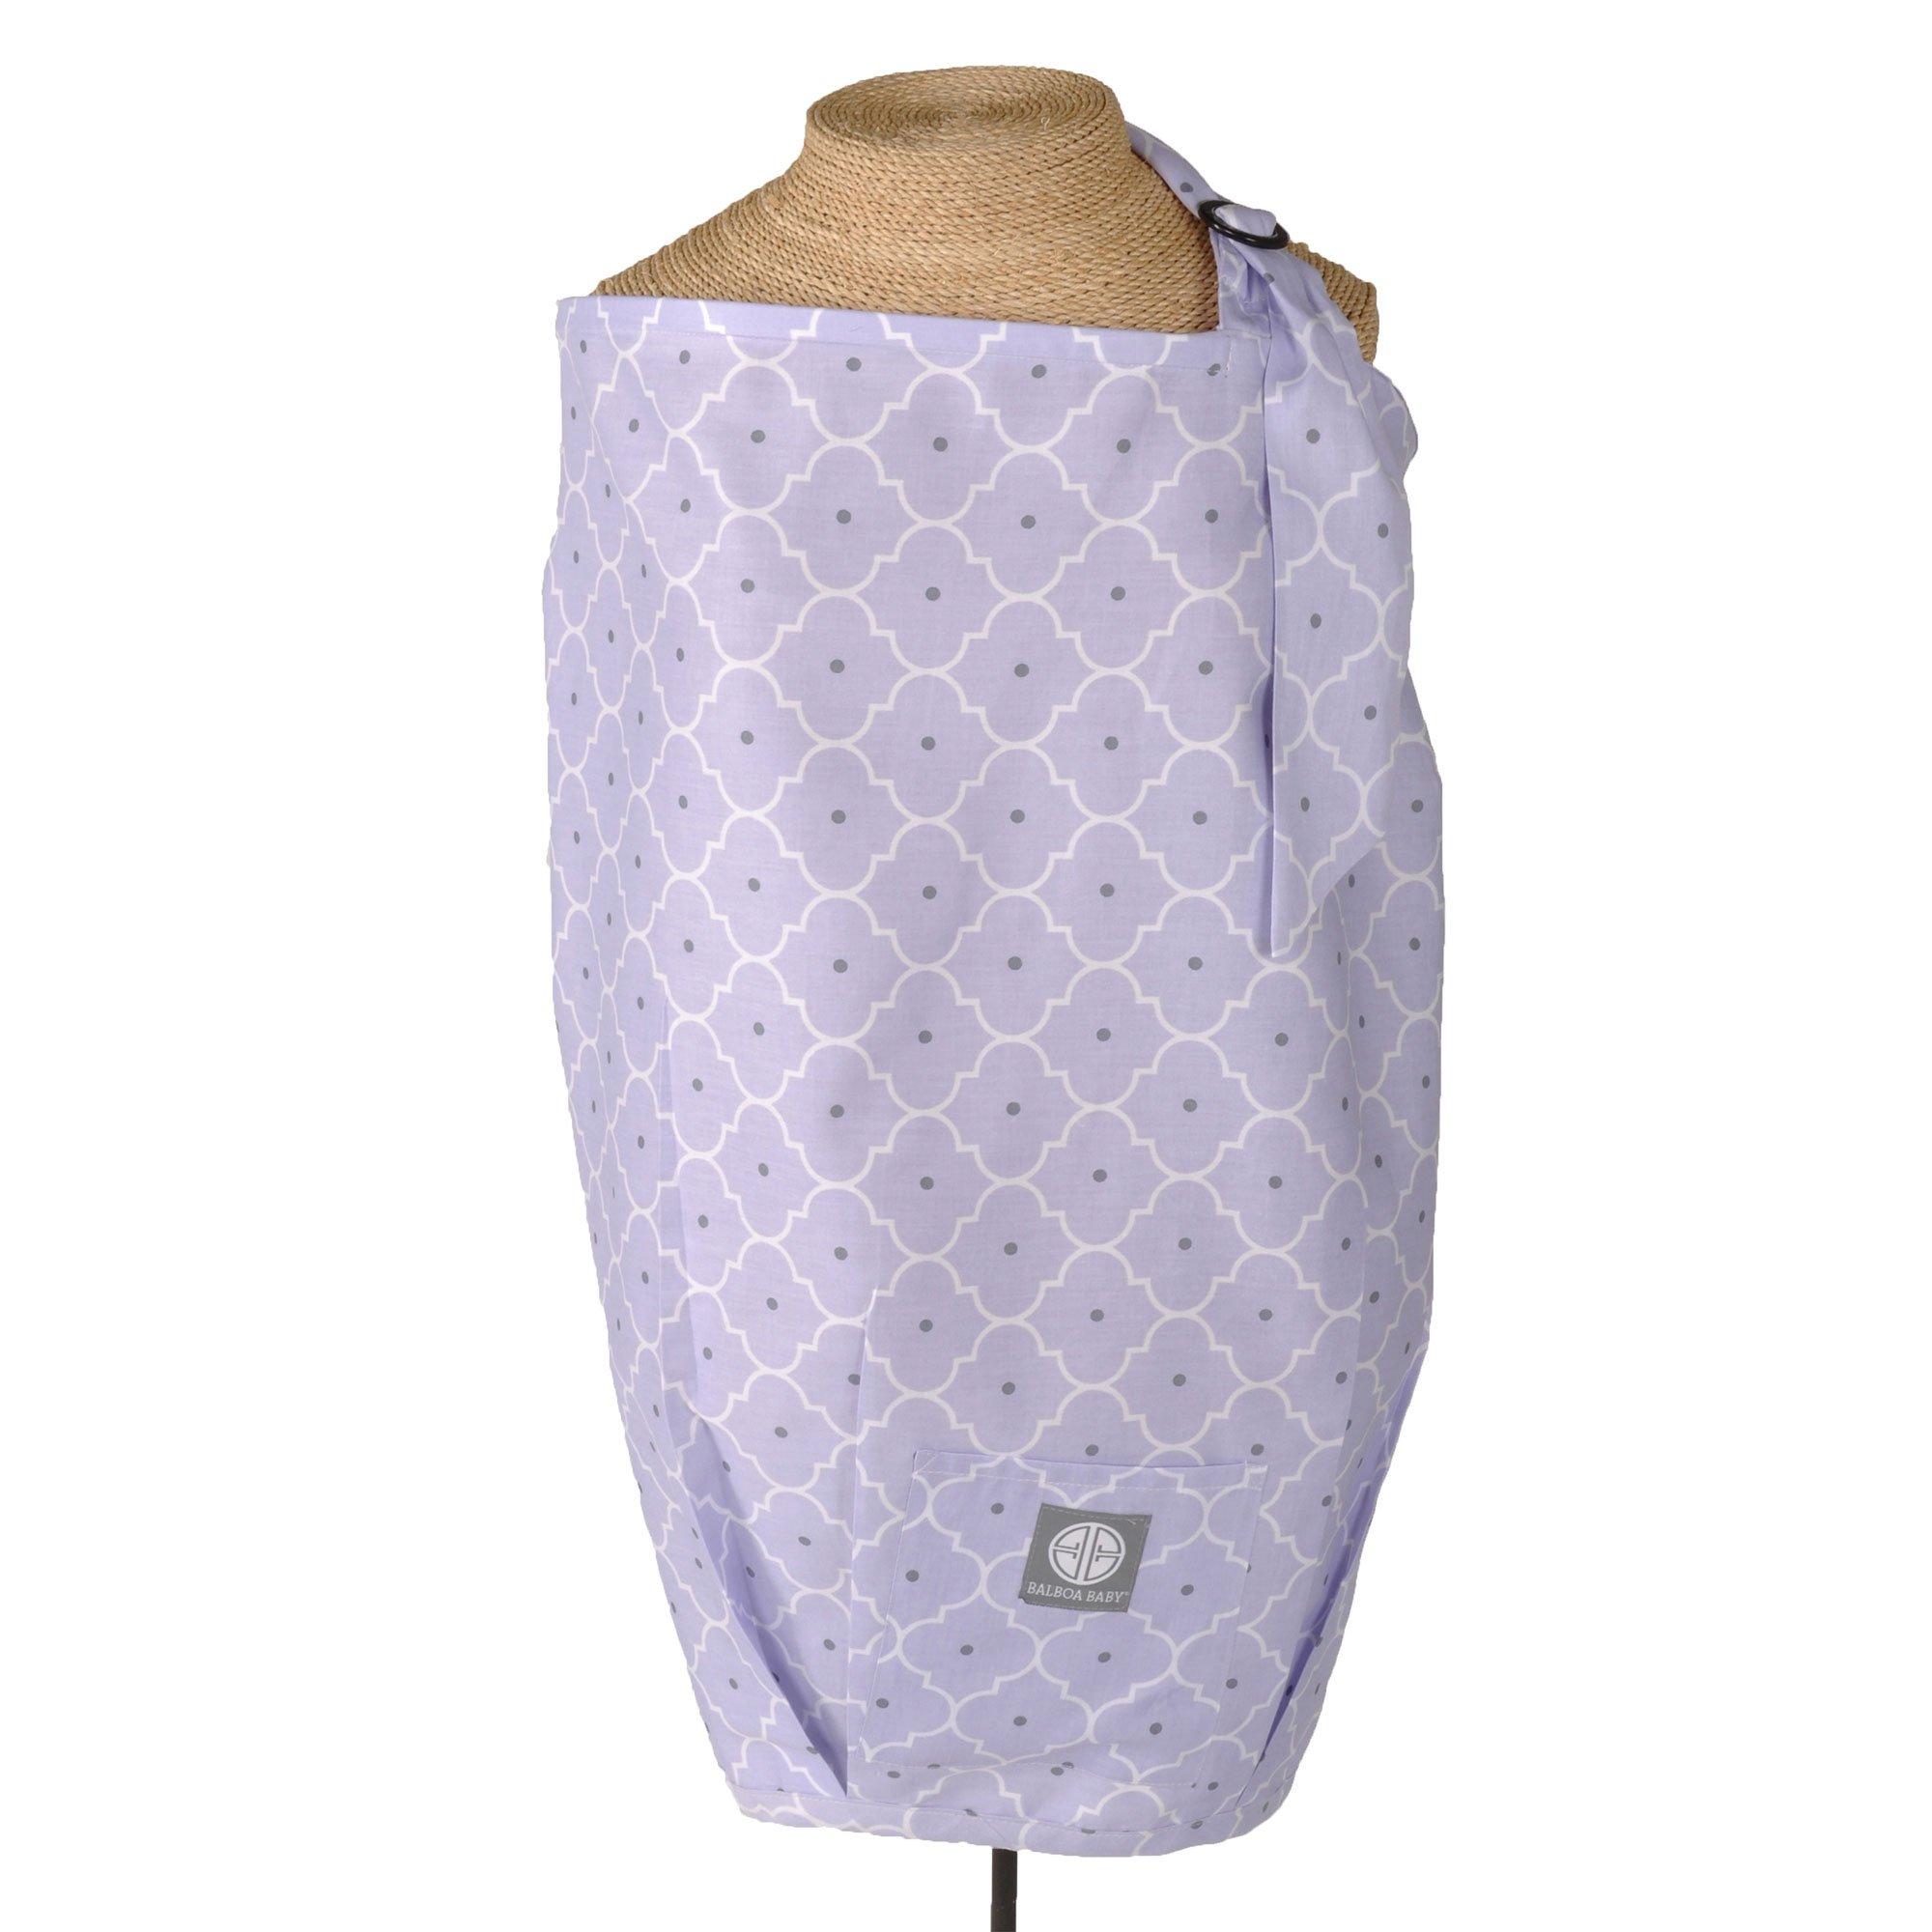 Balboa Baby Dr. Sears Nursing Cover - Lavender Trellis by Balboa Baby